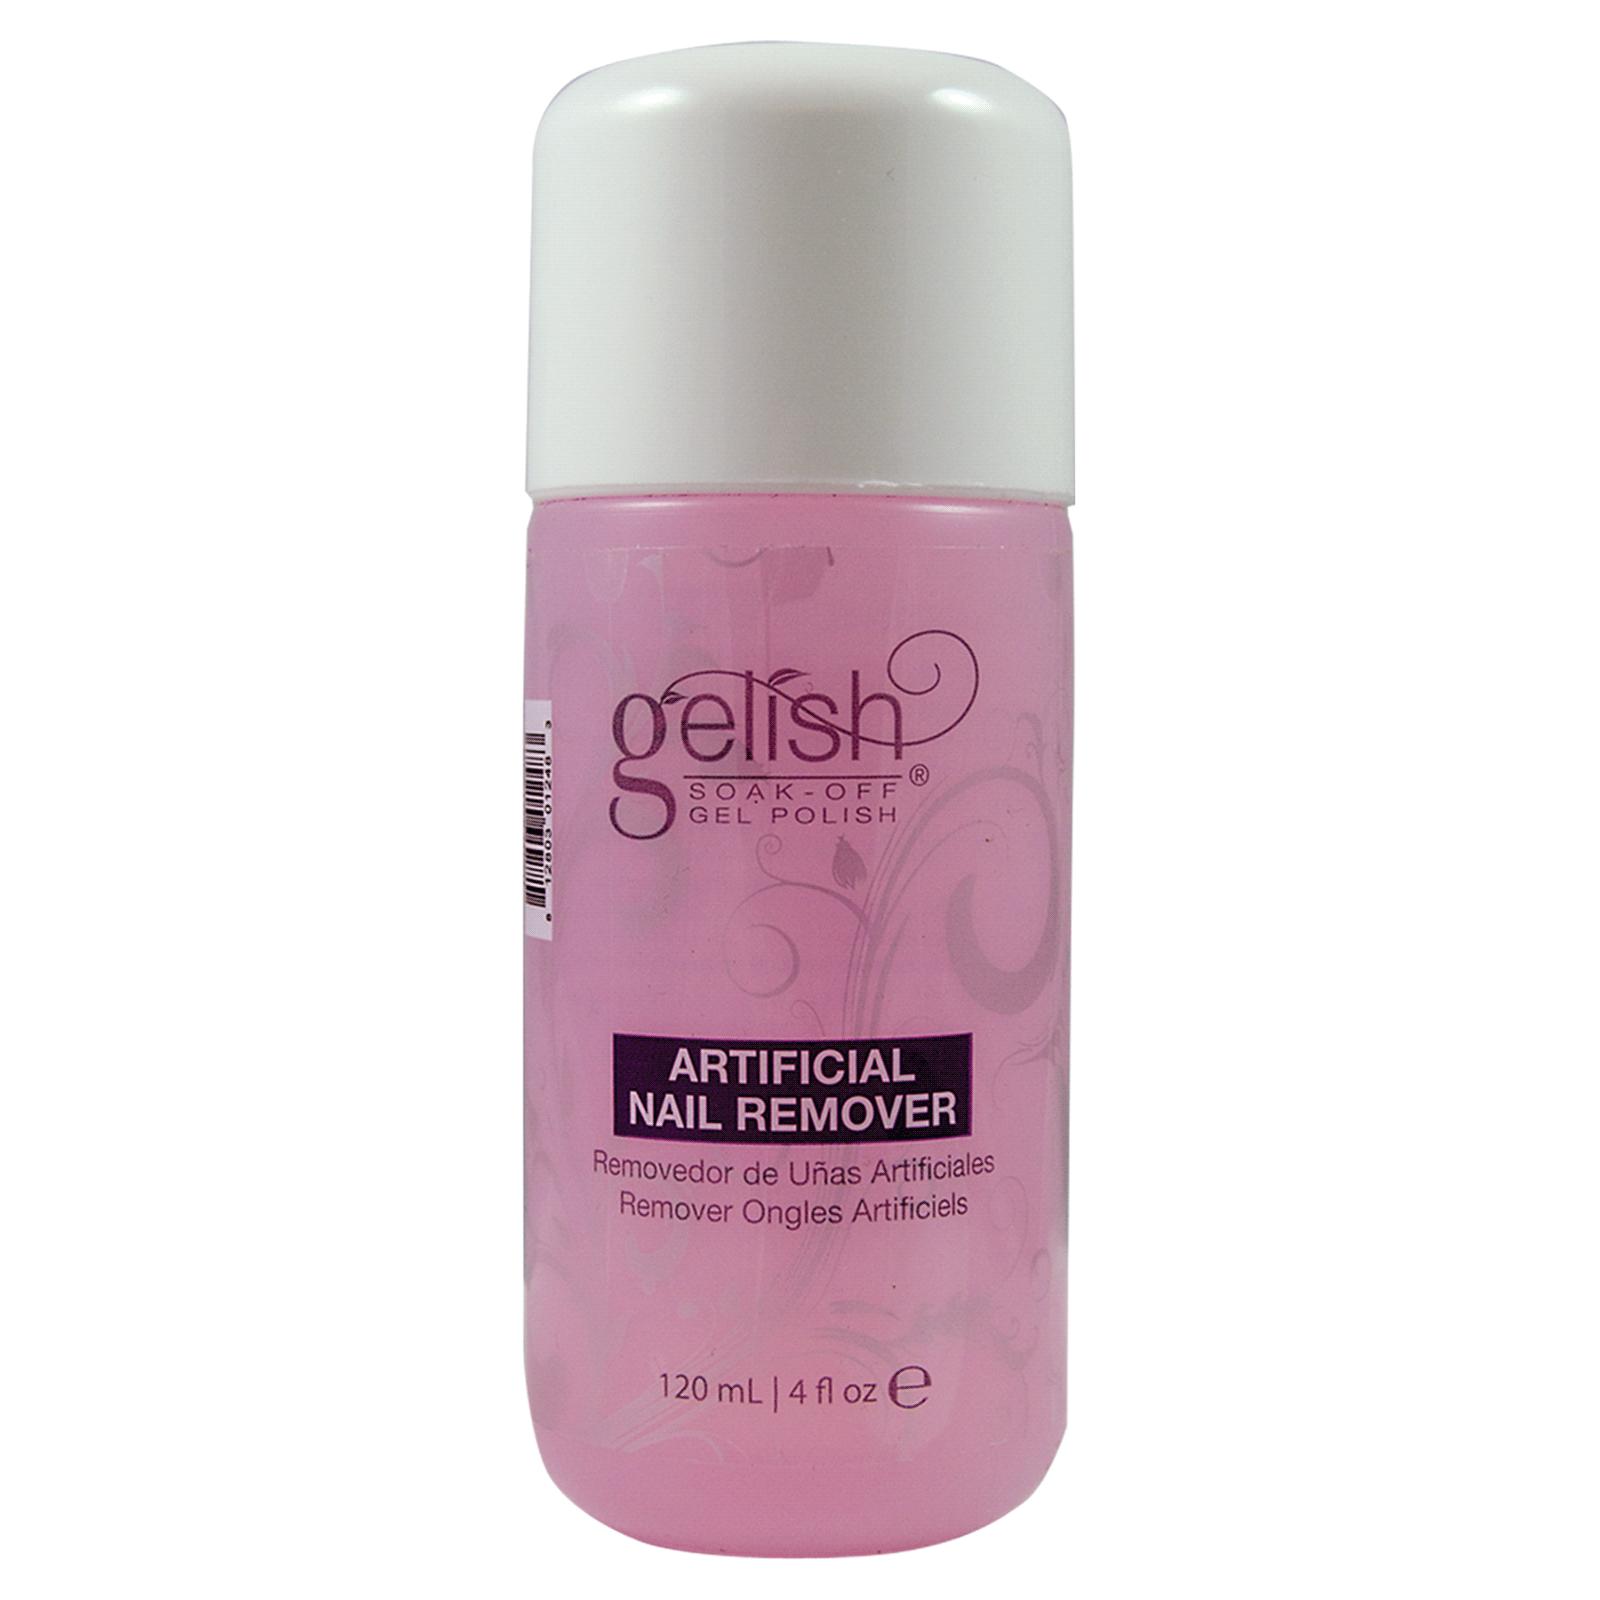 Artificial Nail Remover - Gelish | CosmoProf